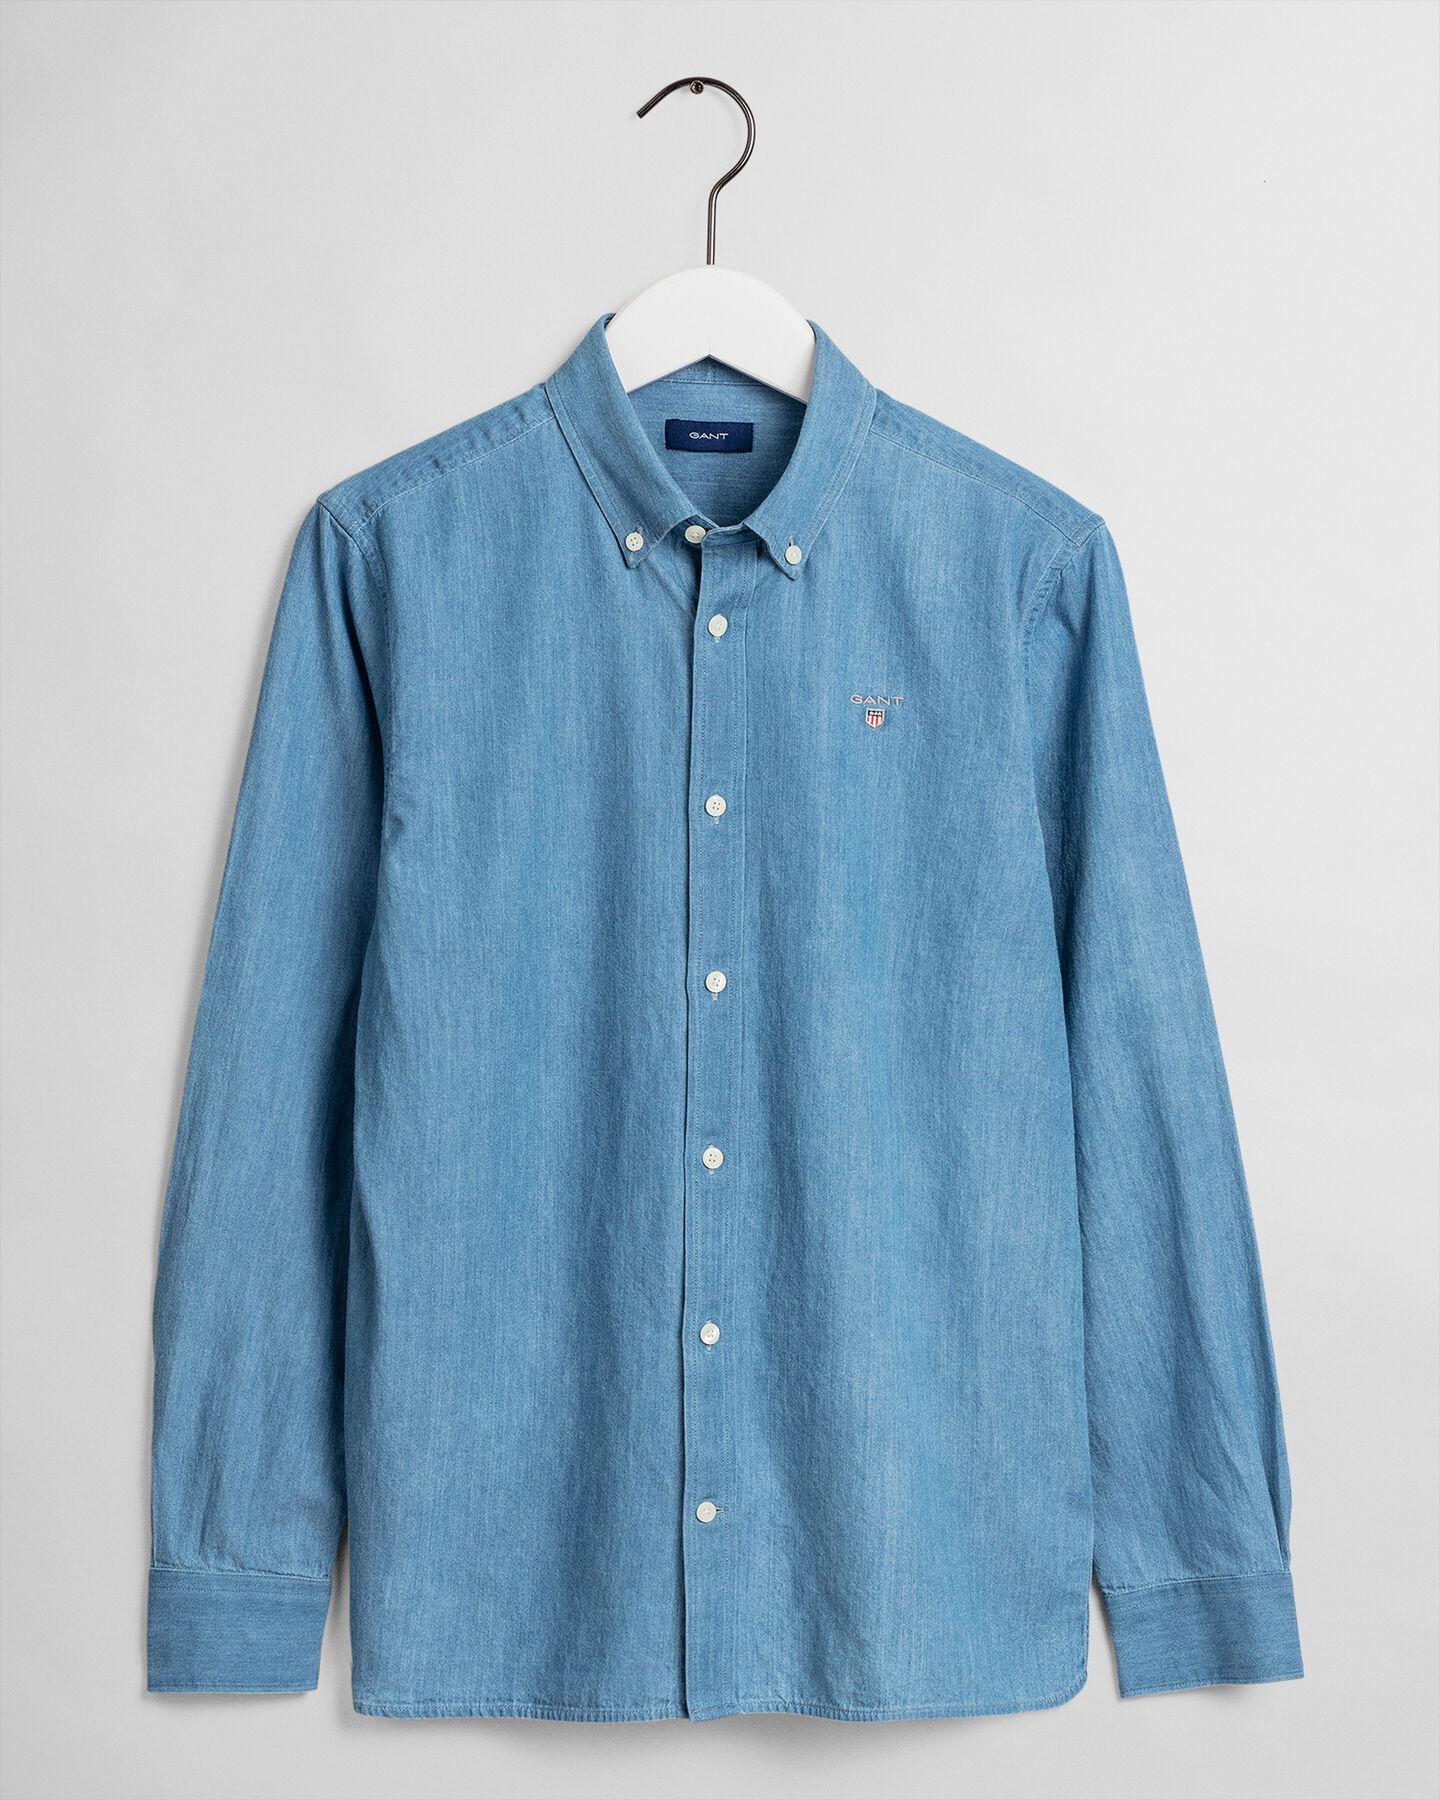 Teen Boys Indigofärgad skjorta